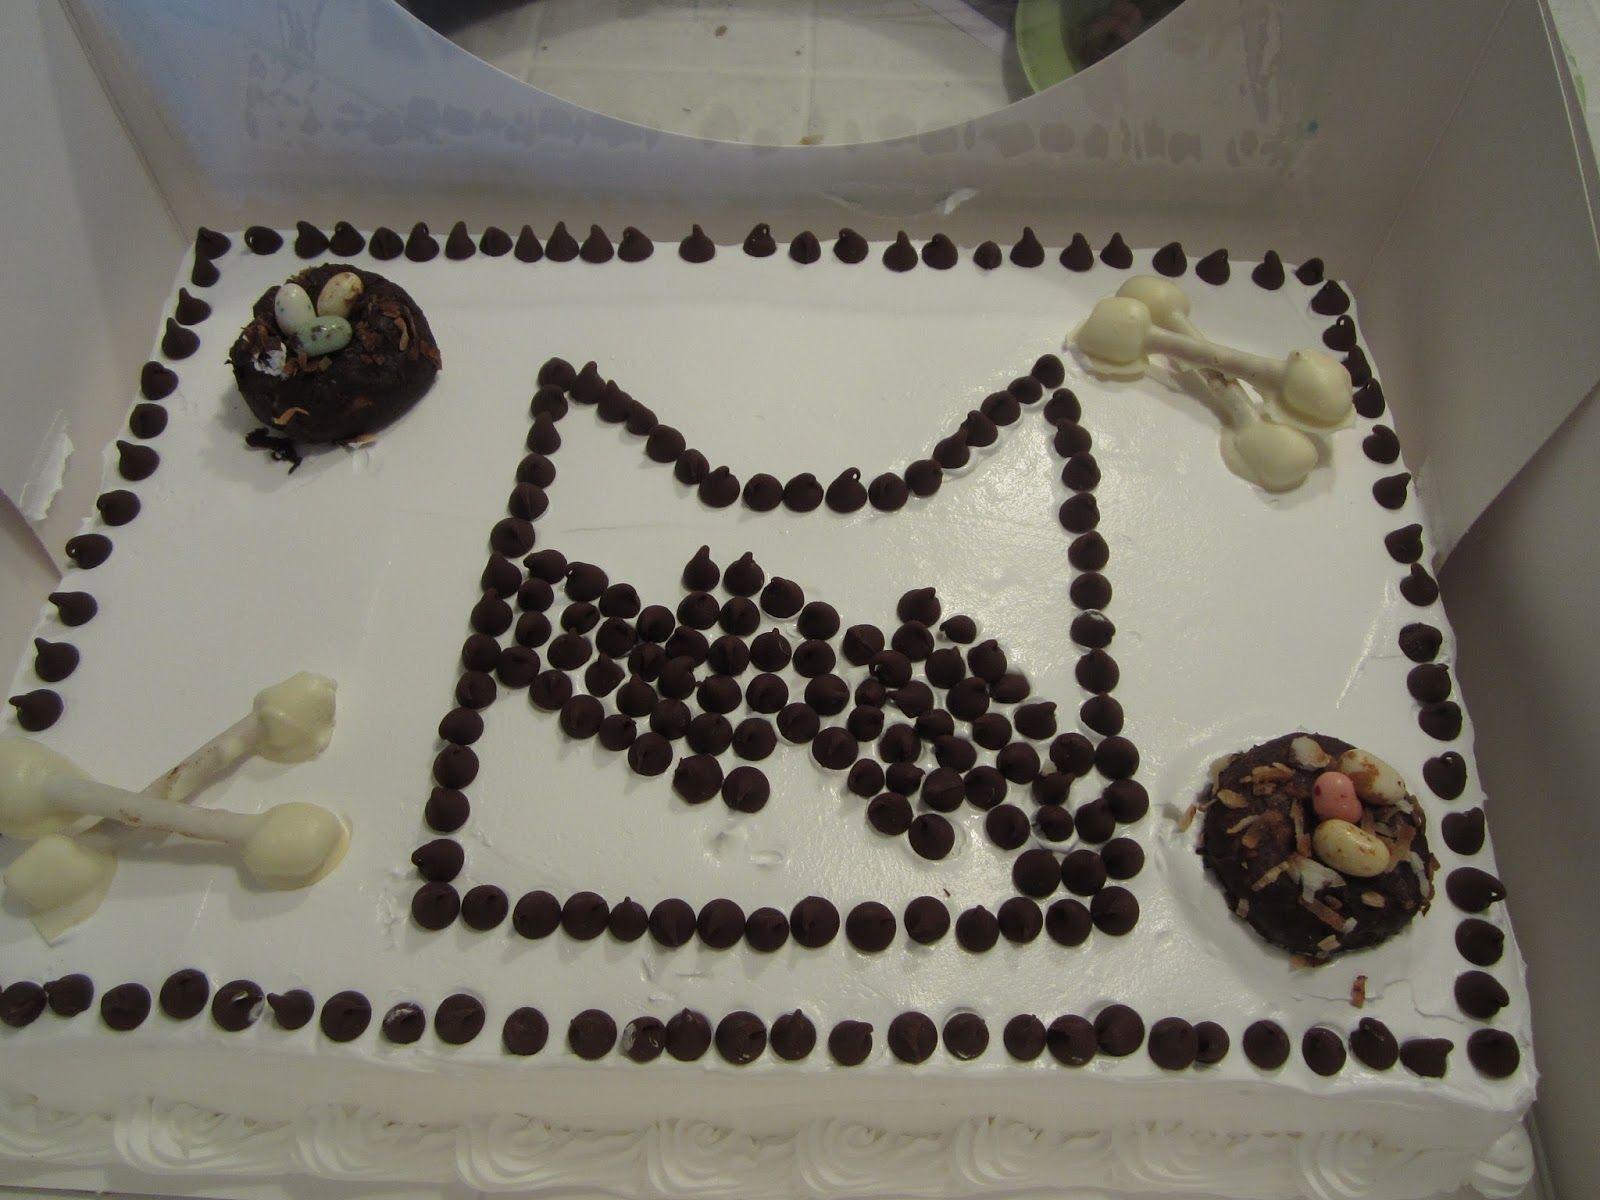 Warrior Cats Birthday Party The Cake Cake Ideas Pinterest